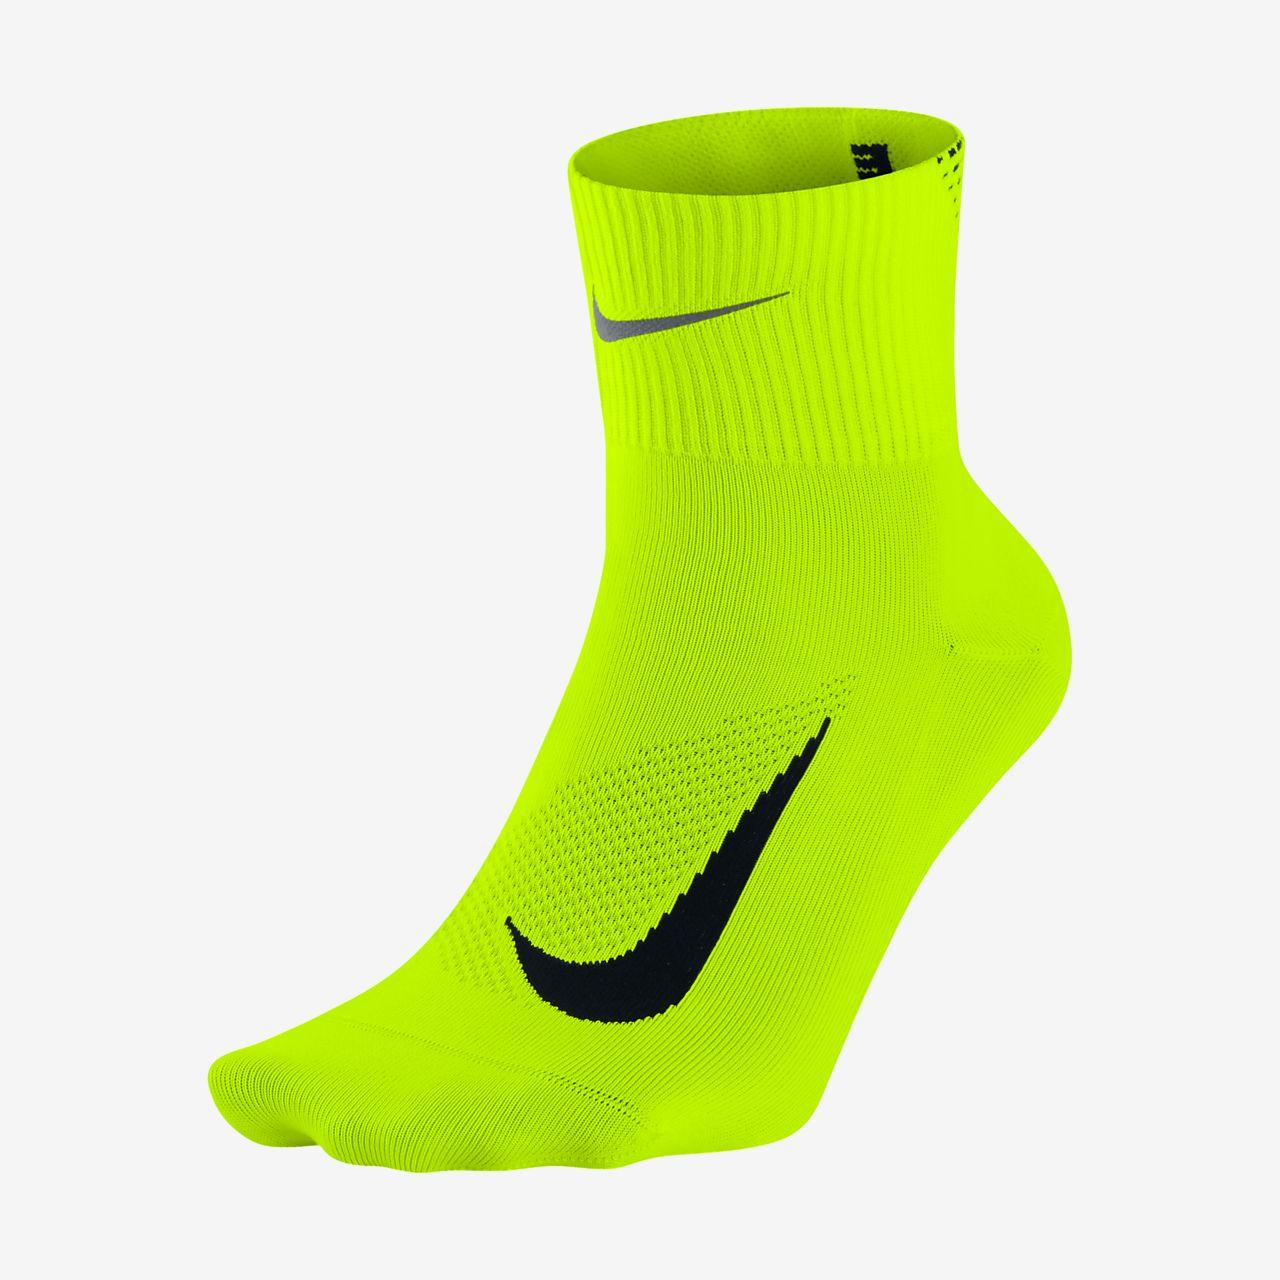 taille 40 1634a 47f7c Chaussettes de running Nike Elite Lightweight 2.0 Quarter